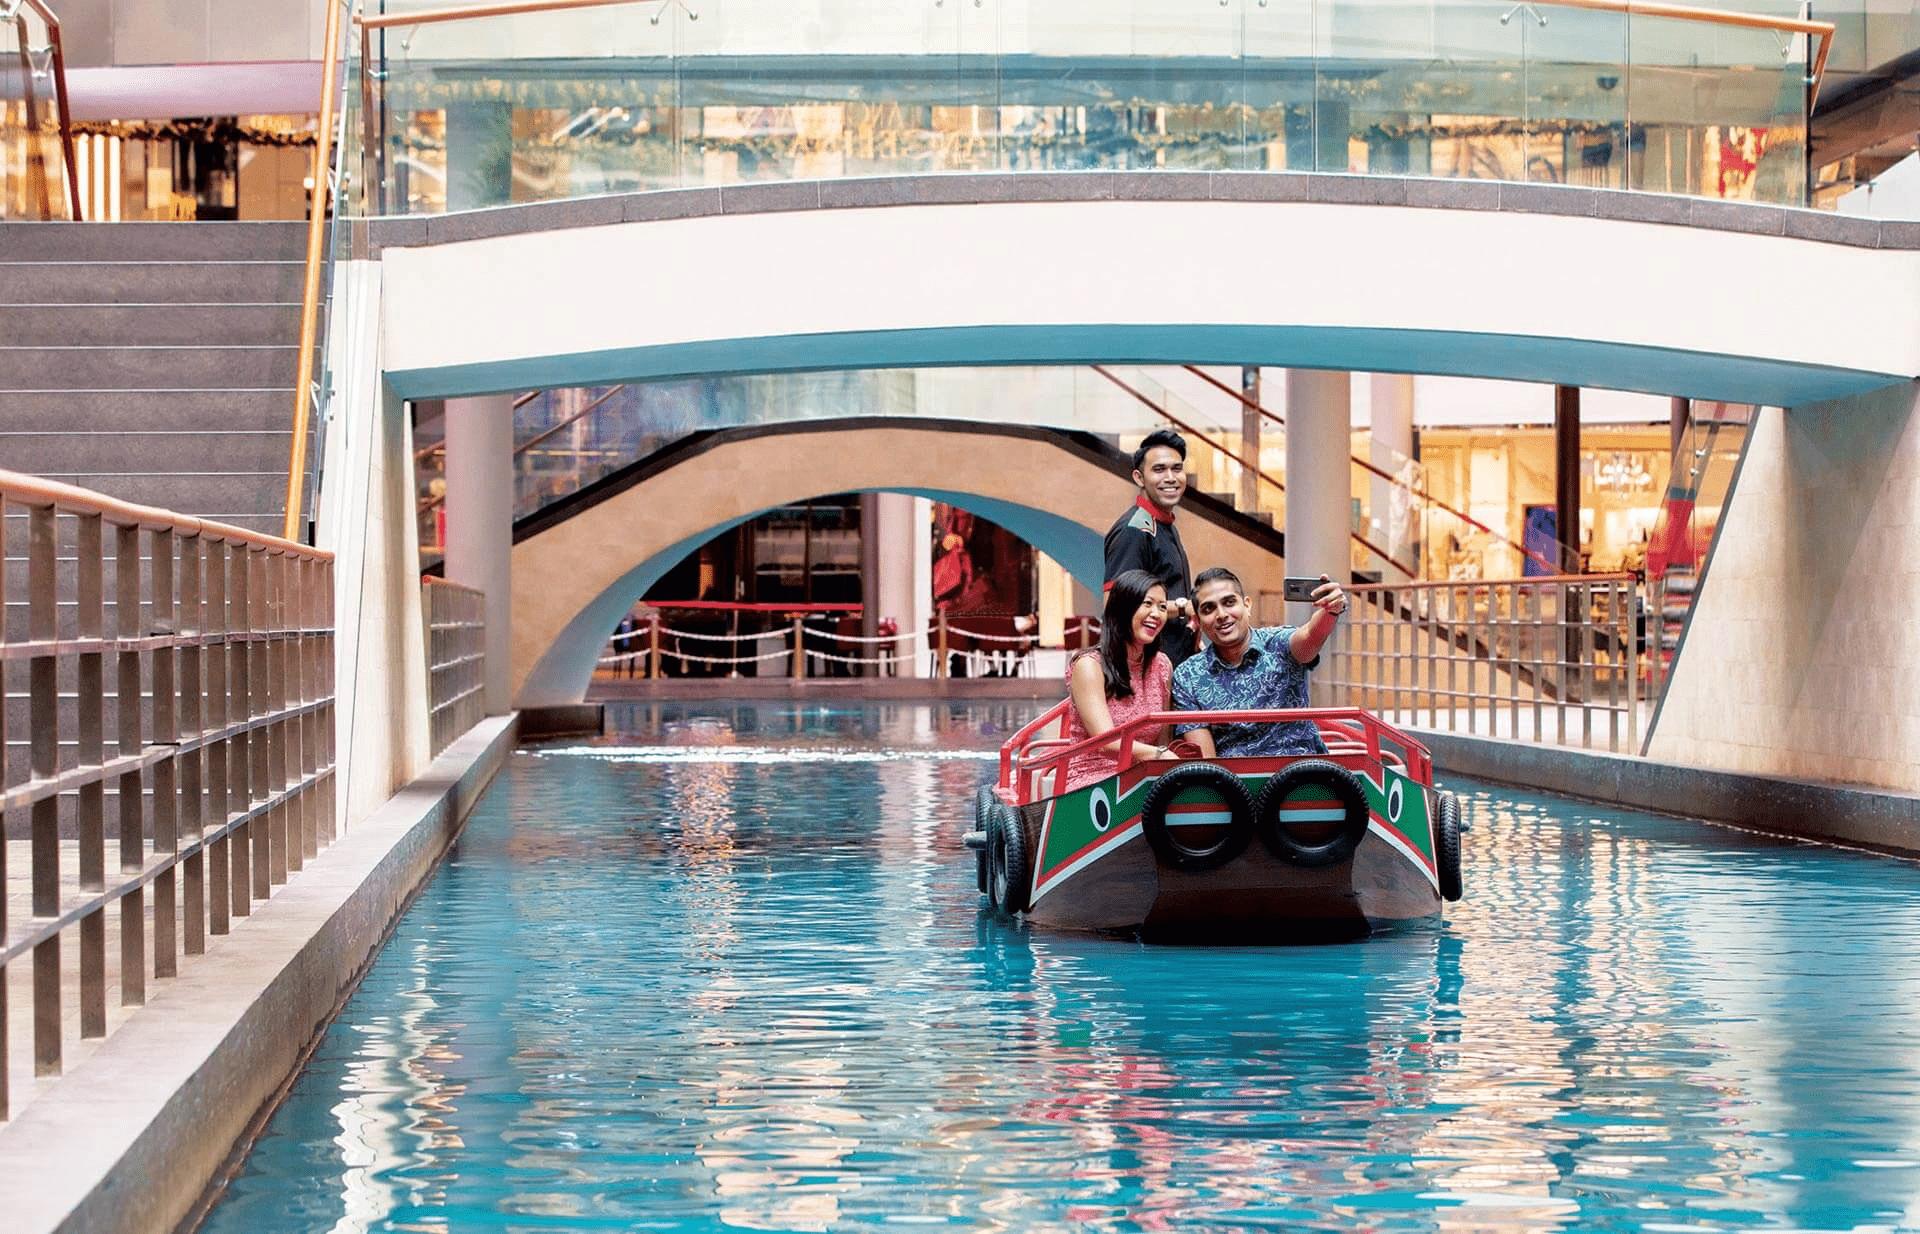 Sampan ride in Marina Bay Sands The Shoppes